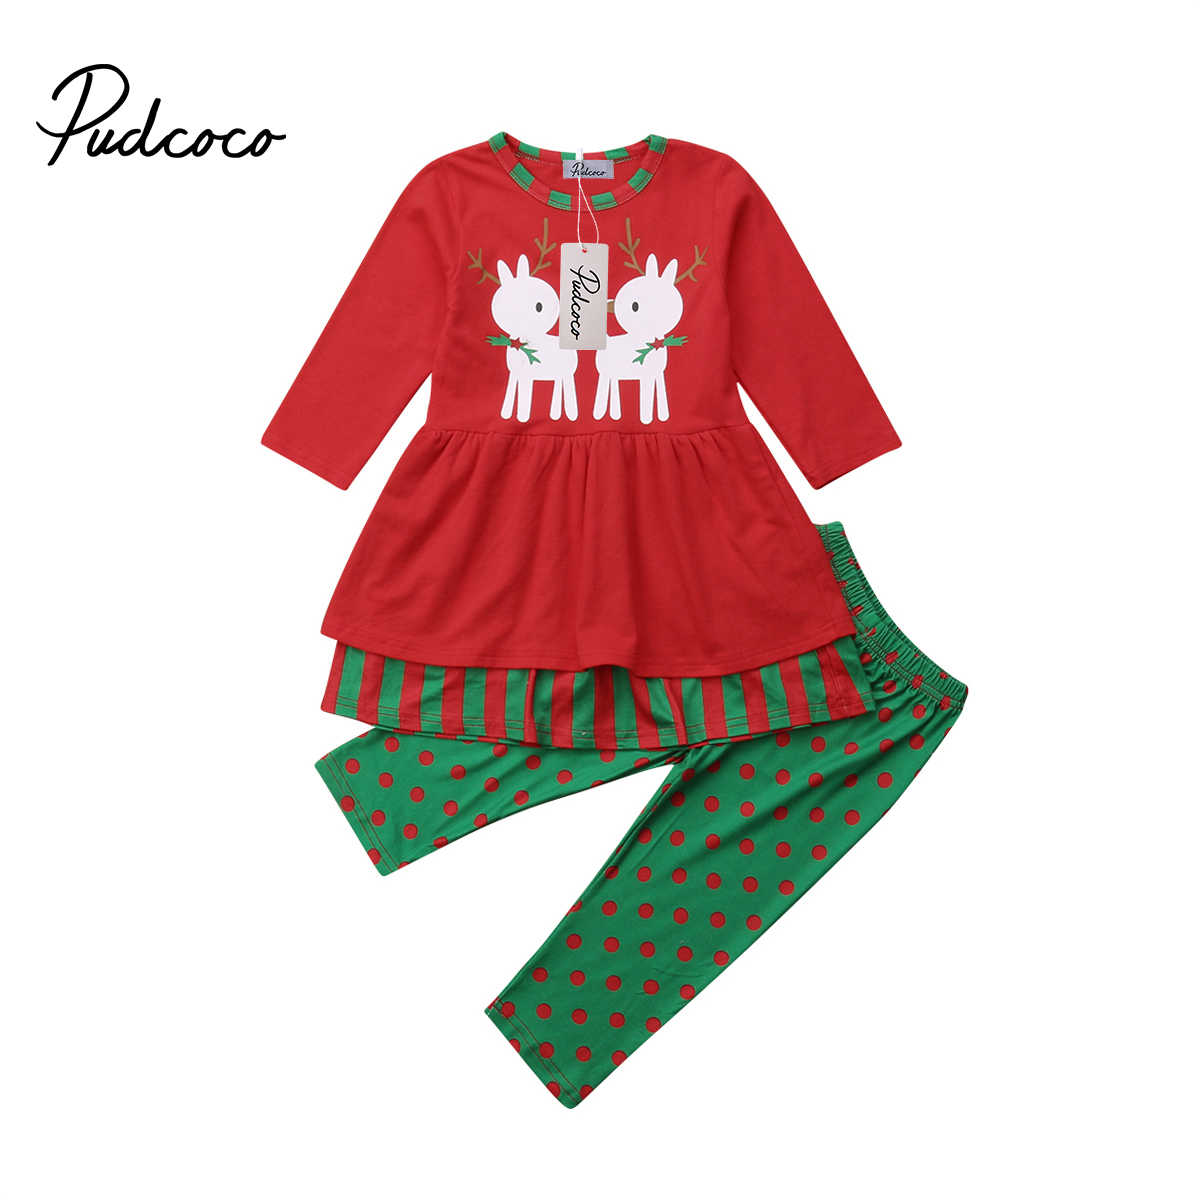 Pants Dress Outfits Set 2PCS Toddler Kids Baby Girls Xmas Clothes T-shirt Tops